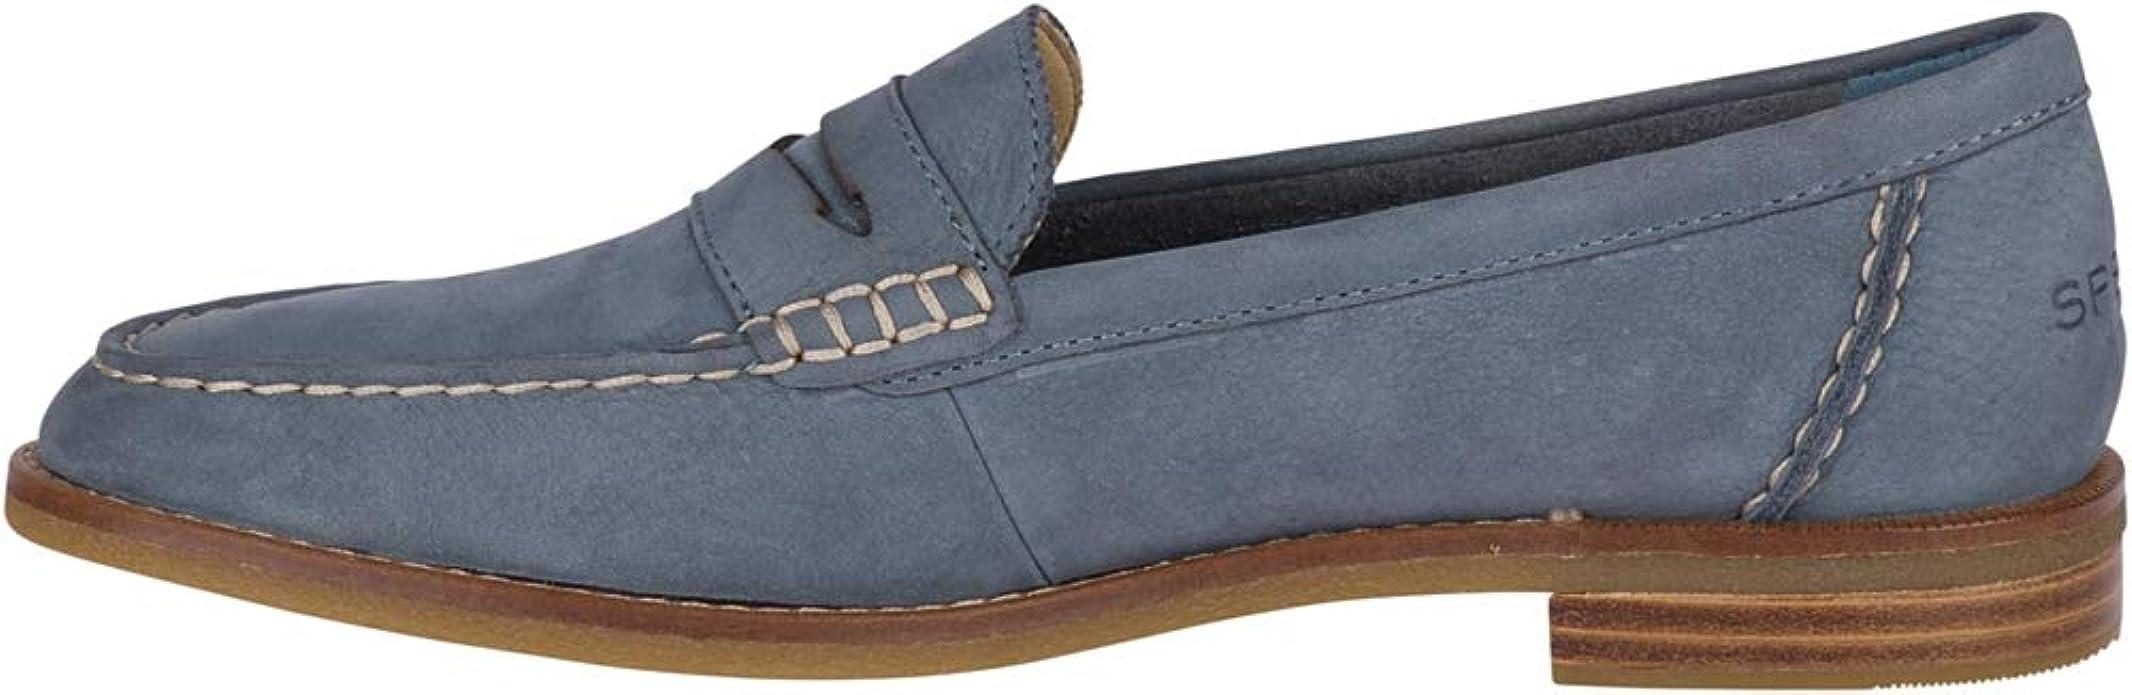 Sperry Top-Sider Seaport Penny Loafer Women 5 Slate Blue